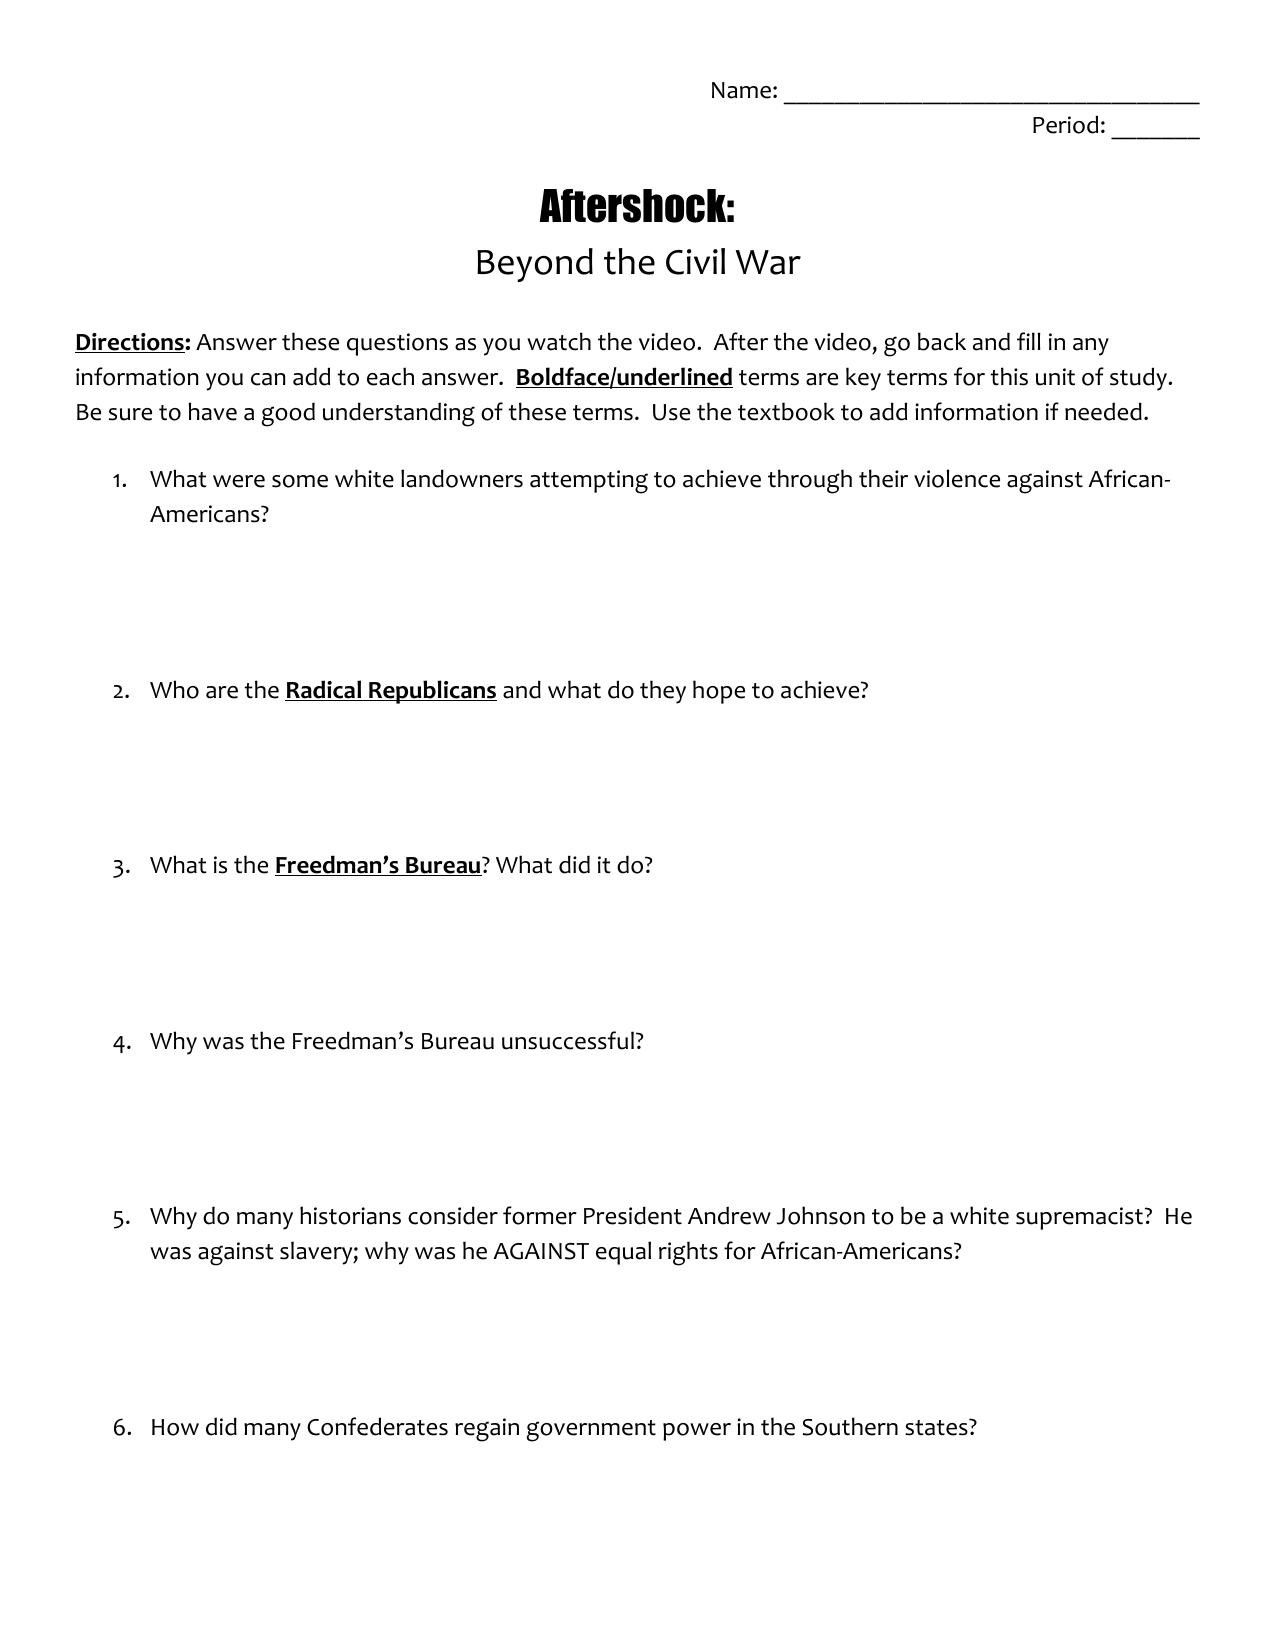 worksheet Civil War Worksheet aftershock beyond the civil war